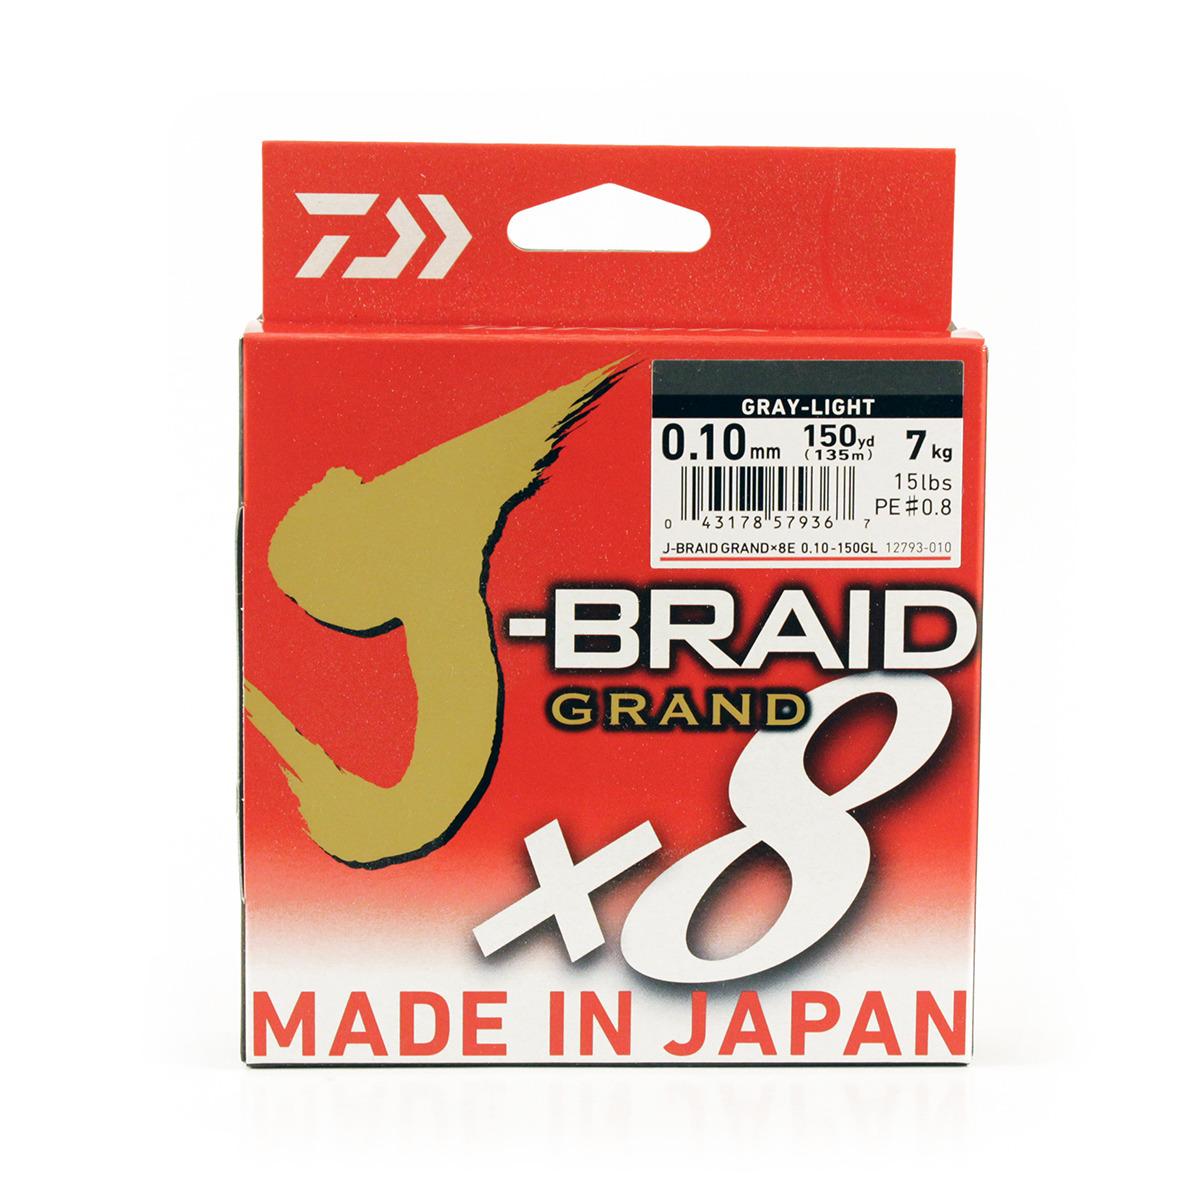 Плетеный шнур Daiwa J-Braid Grand X8, 69575, светло-серый, 150 м, 0,1 мм j